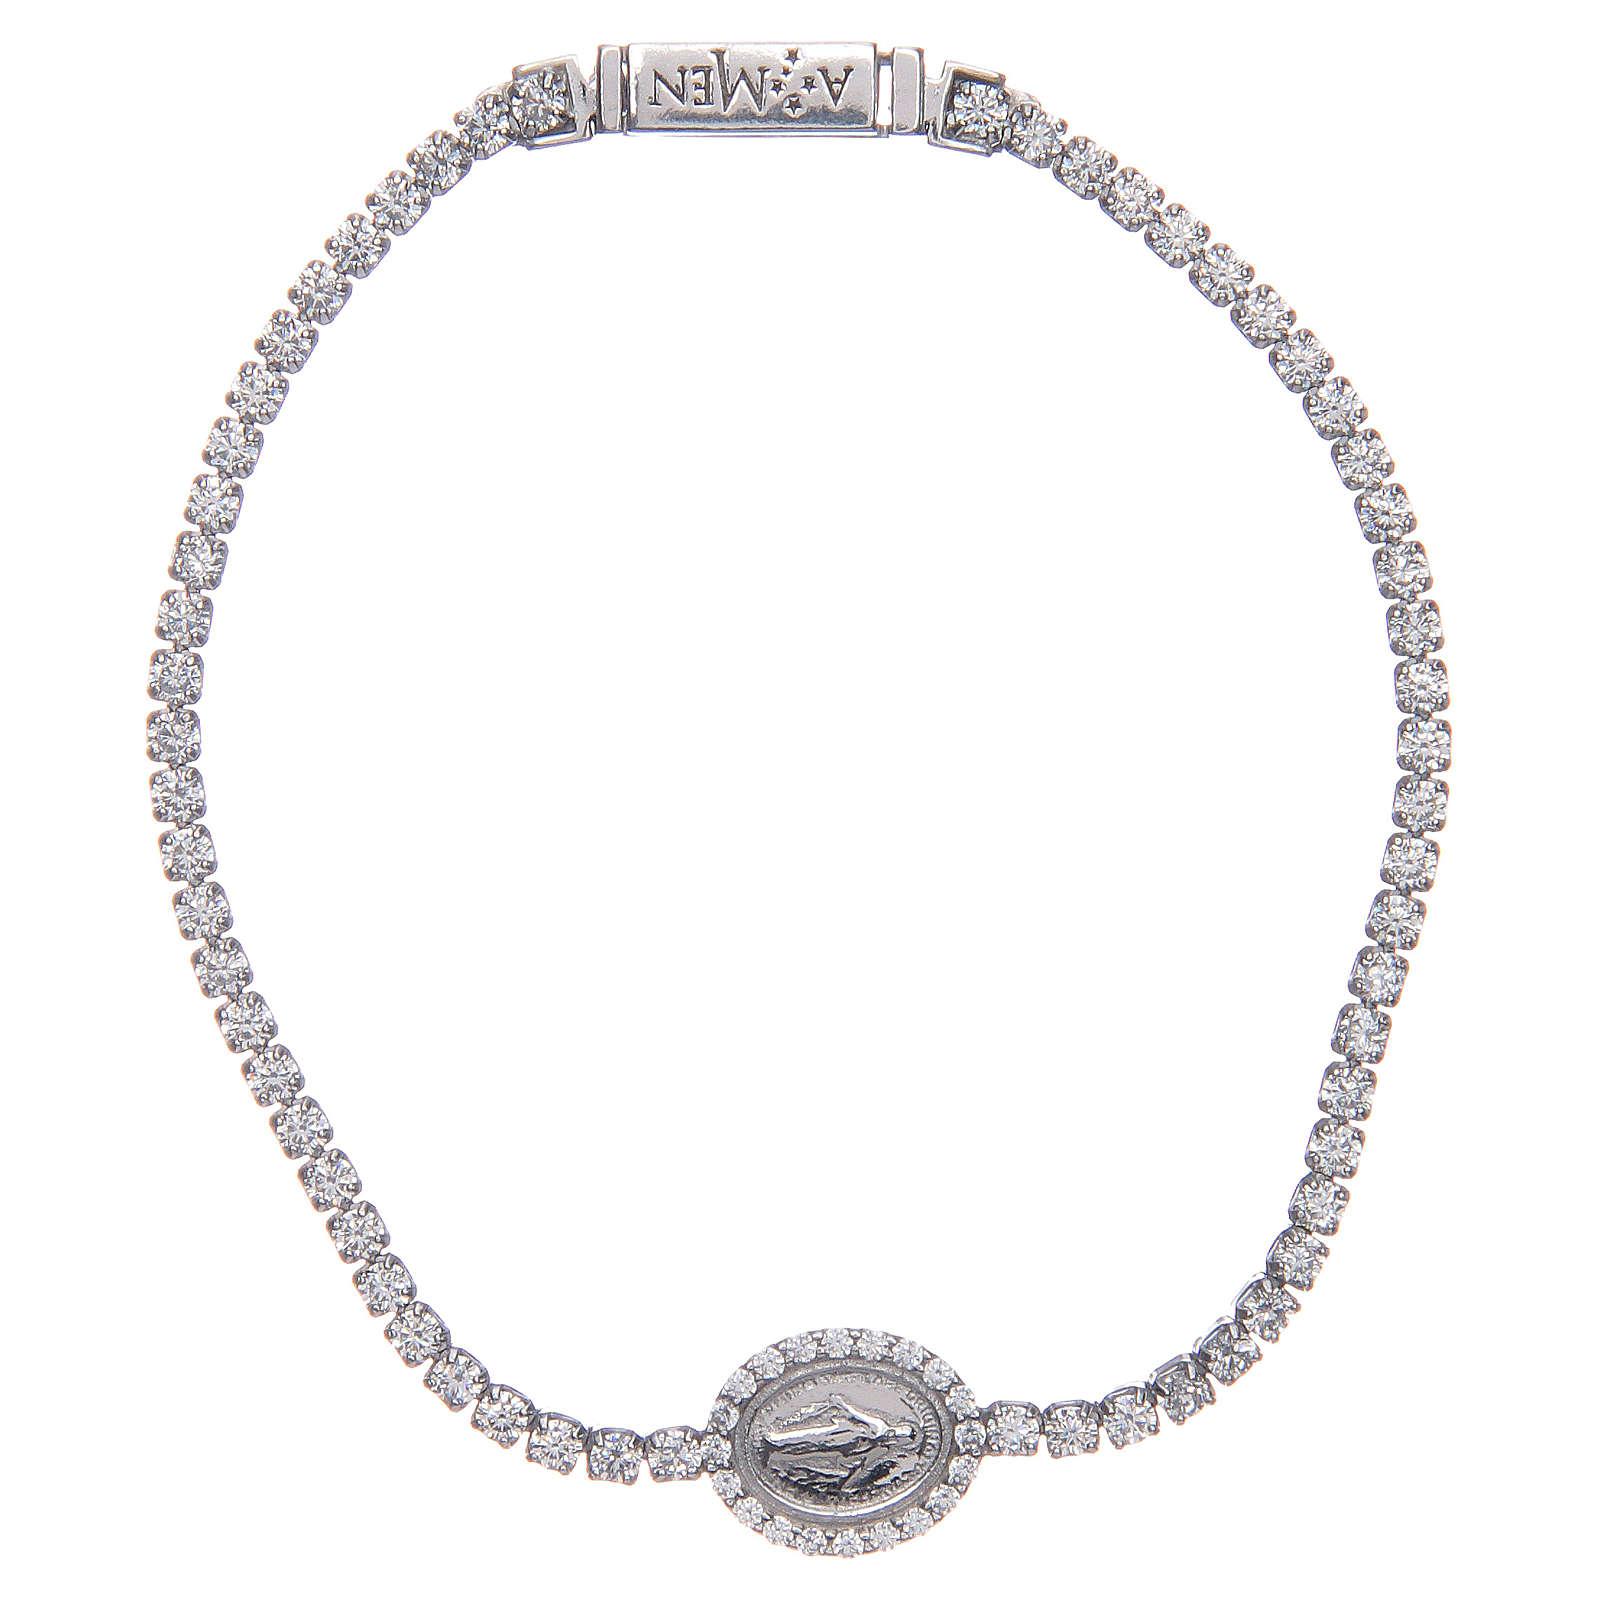 Miraculous medal tennis bracelet, Amen 4